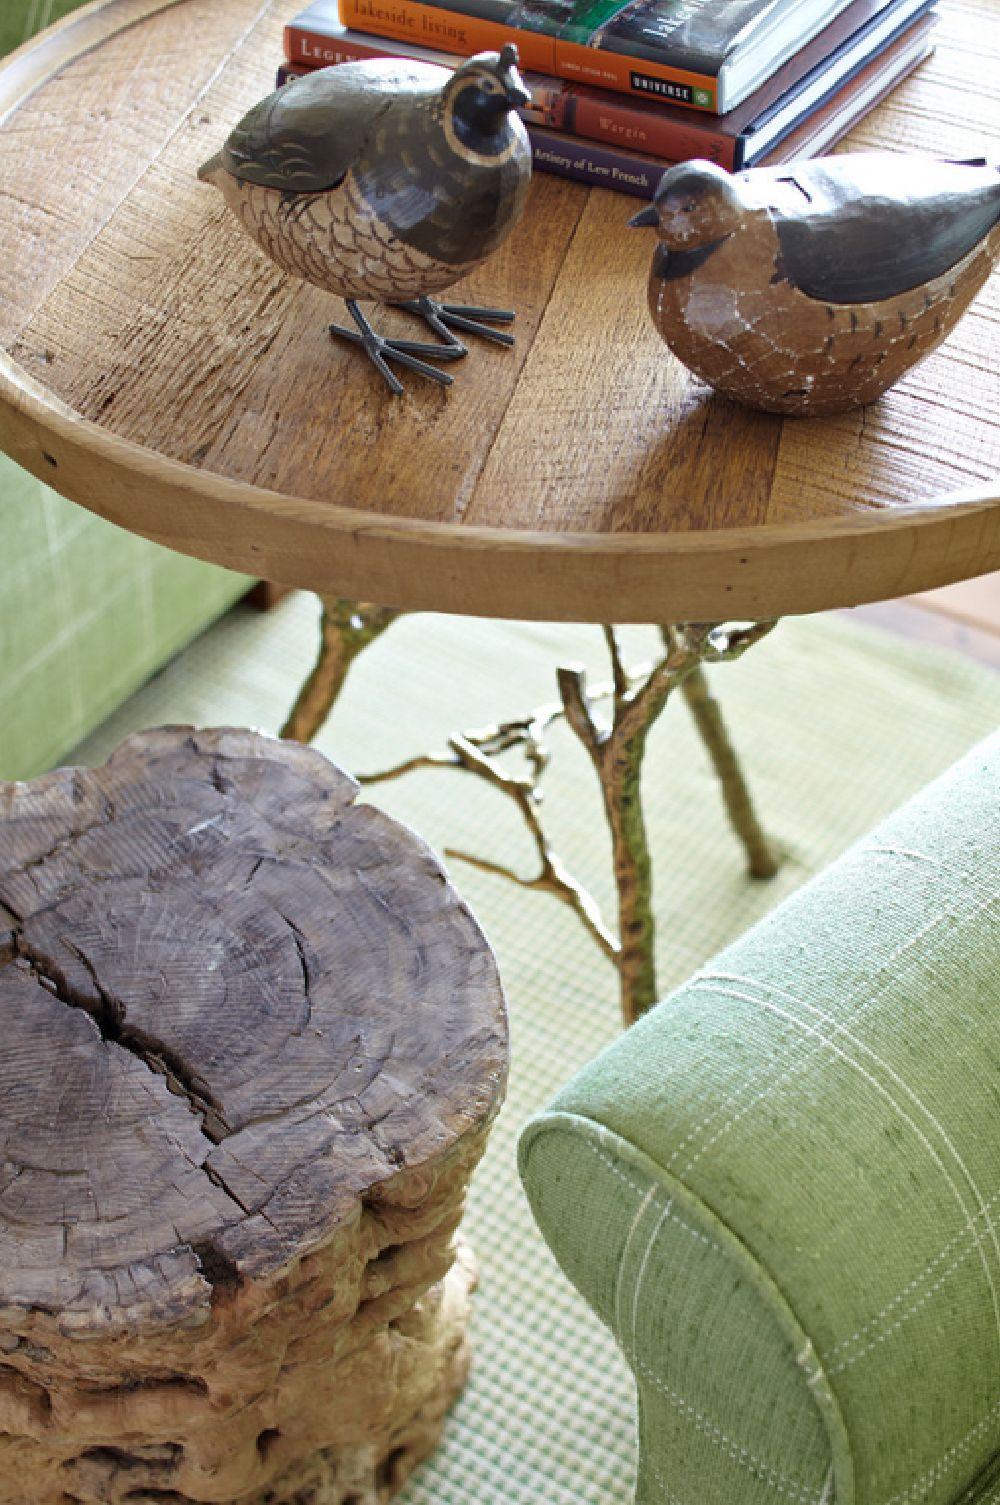 adelaparvu.com casa din lemn cu interior in nuante pastelate, casa SUA Michigan, design interior Tom Stringer, Foto Werner Straube (8)